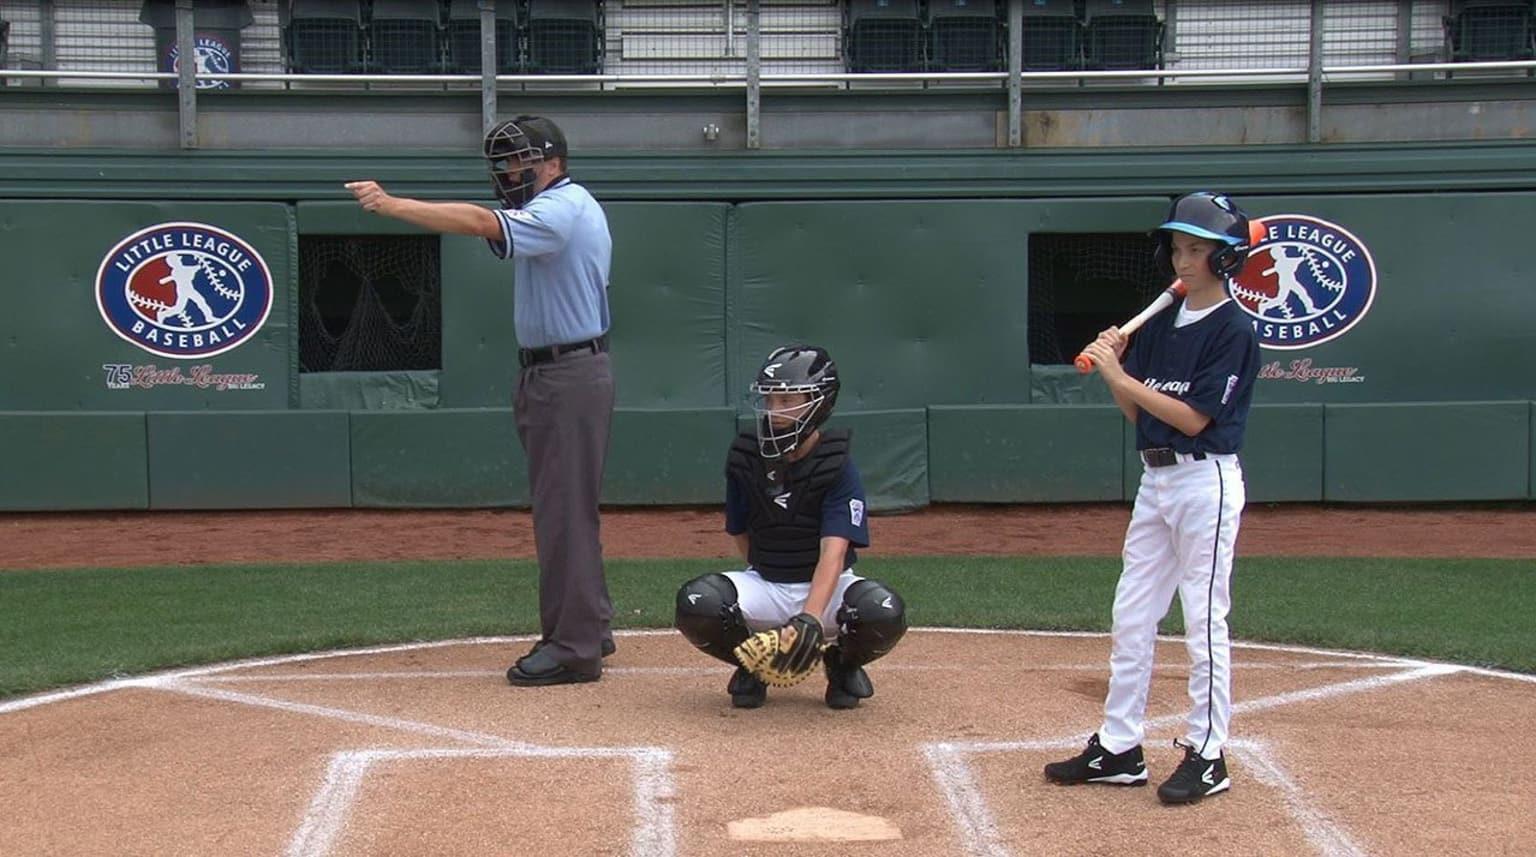 umpire check swing